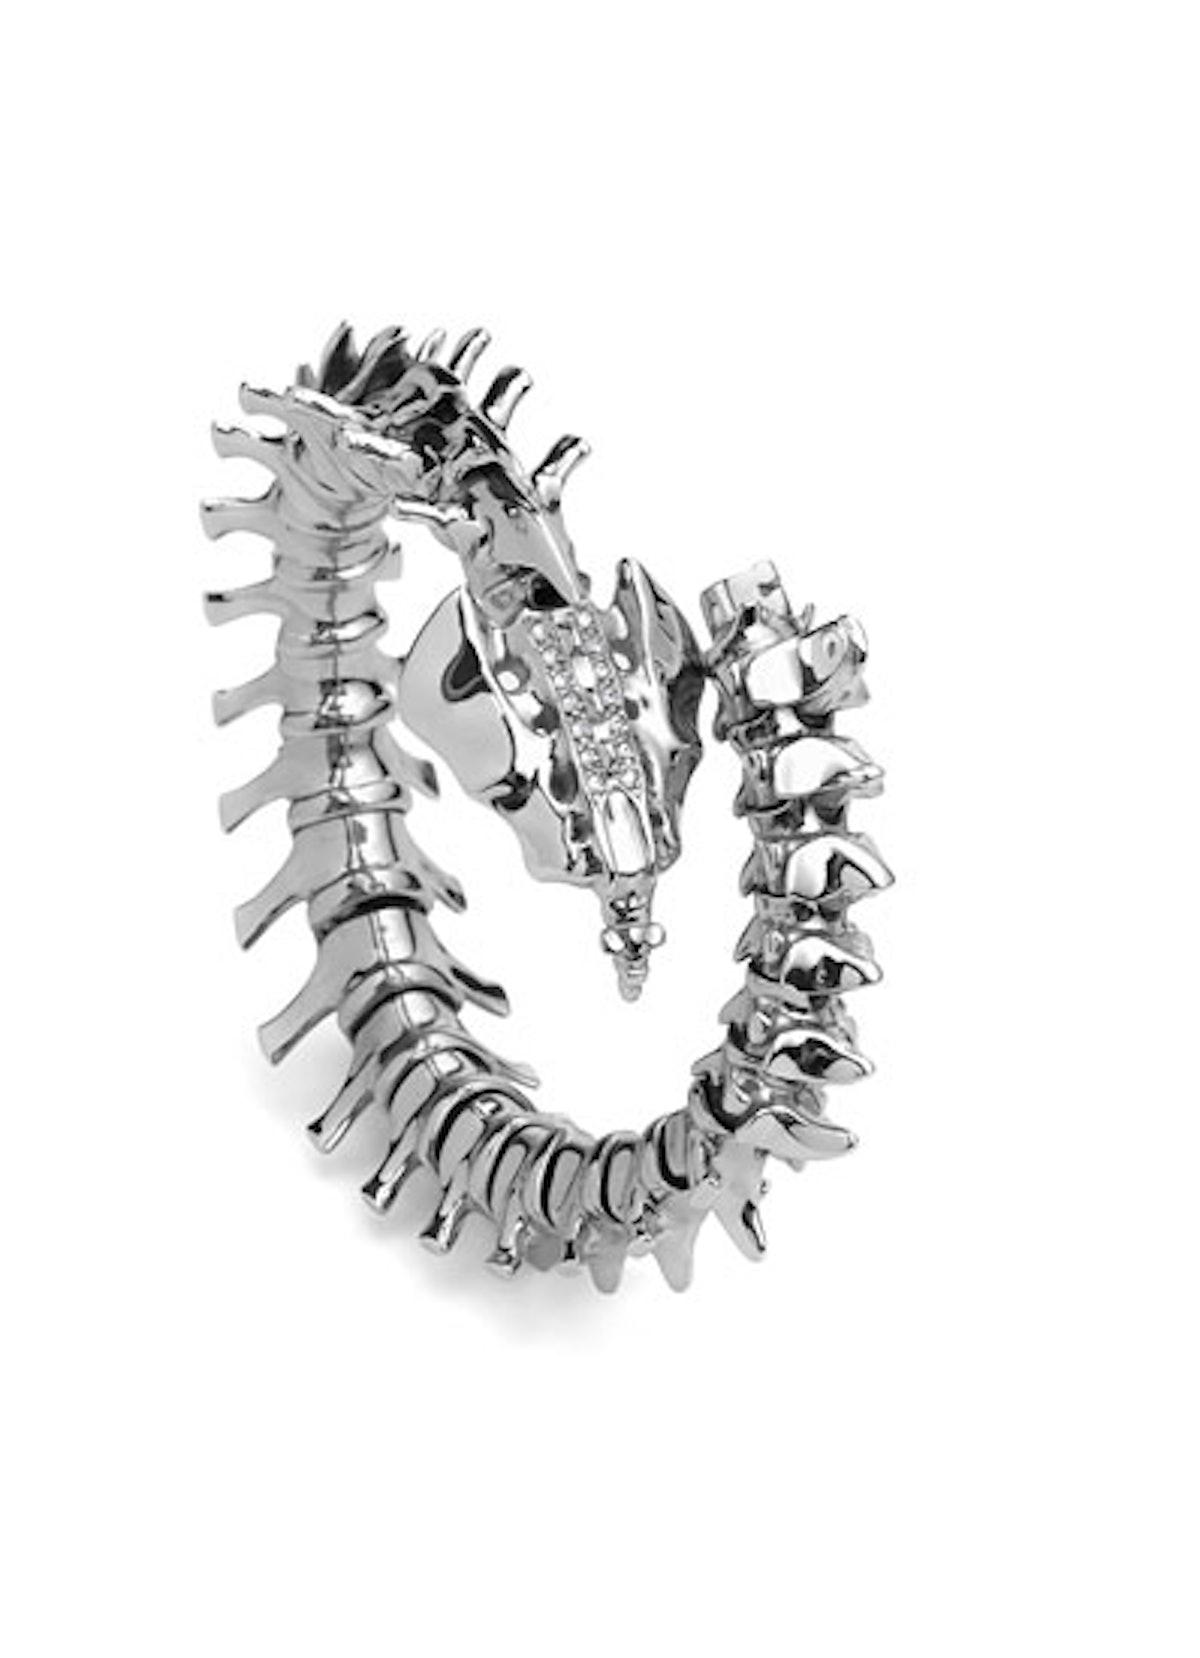 acss-halloween-jewelry-06-v.jpg